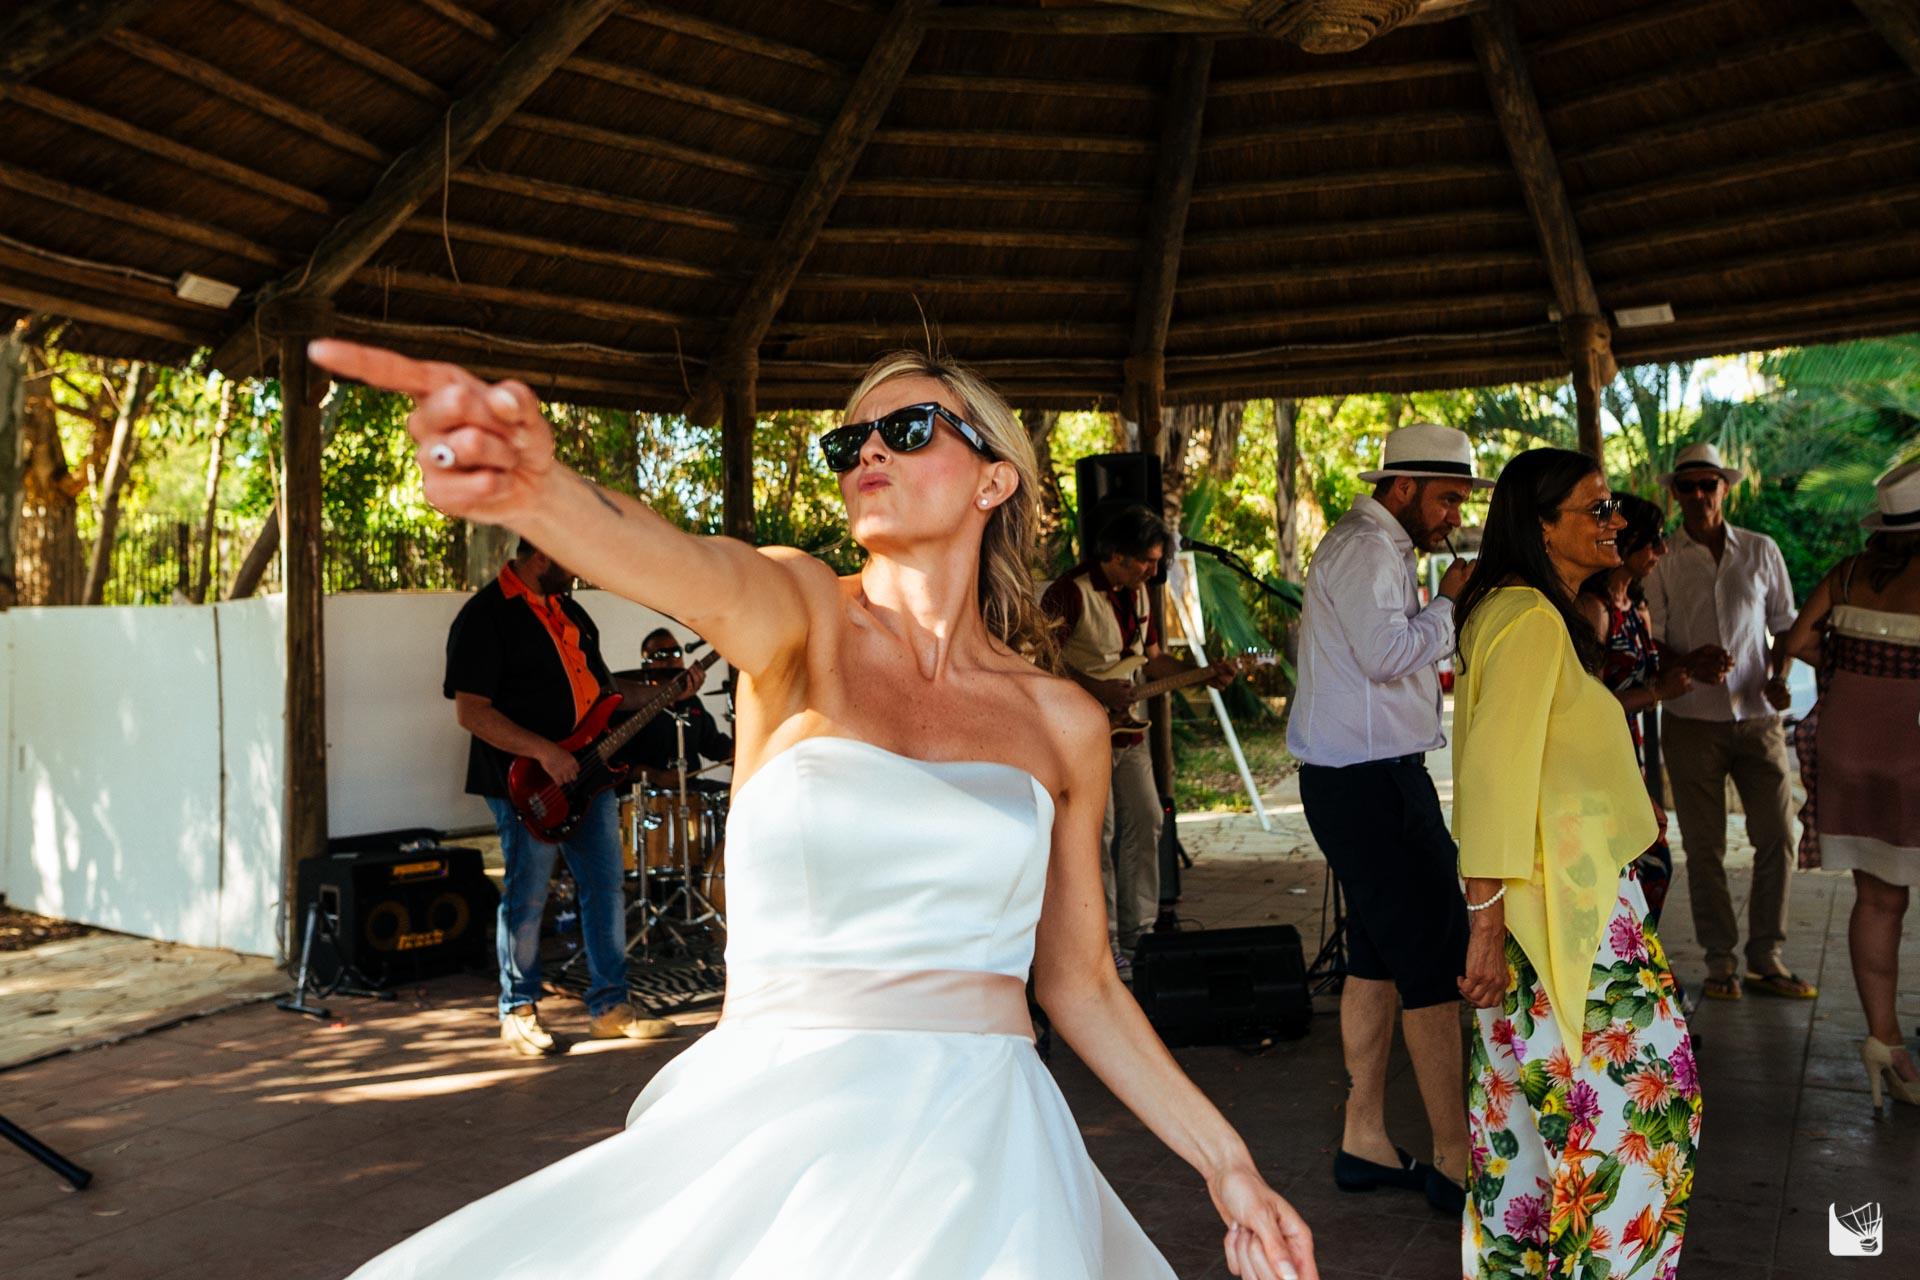 wedding_in_marzamemi-45.jpg